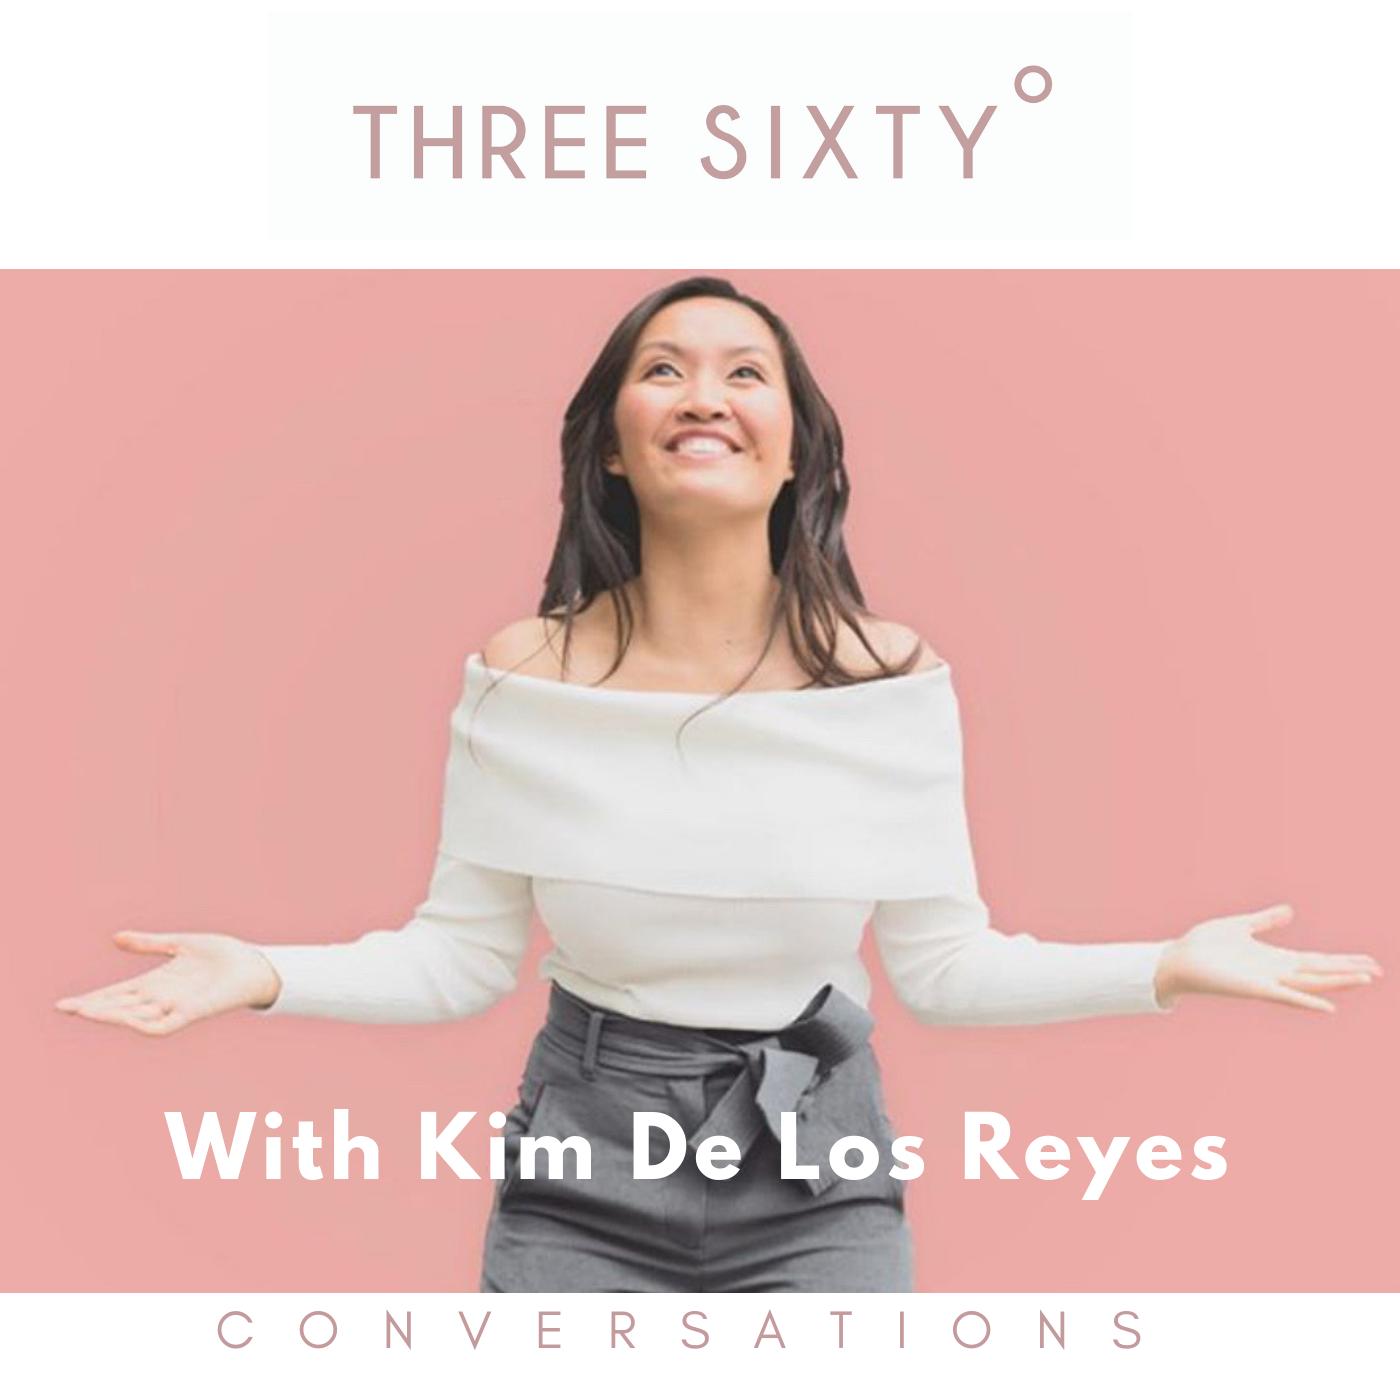 Peak radiance, Kim de los reyes, Tamu Thomas, business coaching. executive coaching, live three sixty, everyday joy, three sixty conversations, three sixty podcast, wellbeing is wellth,